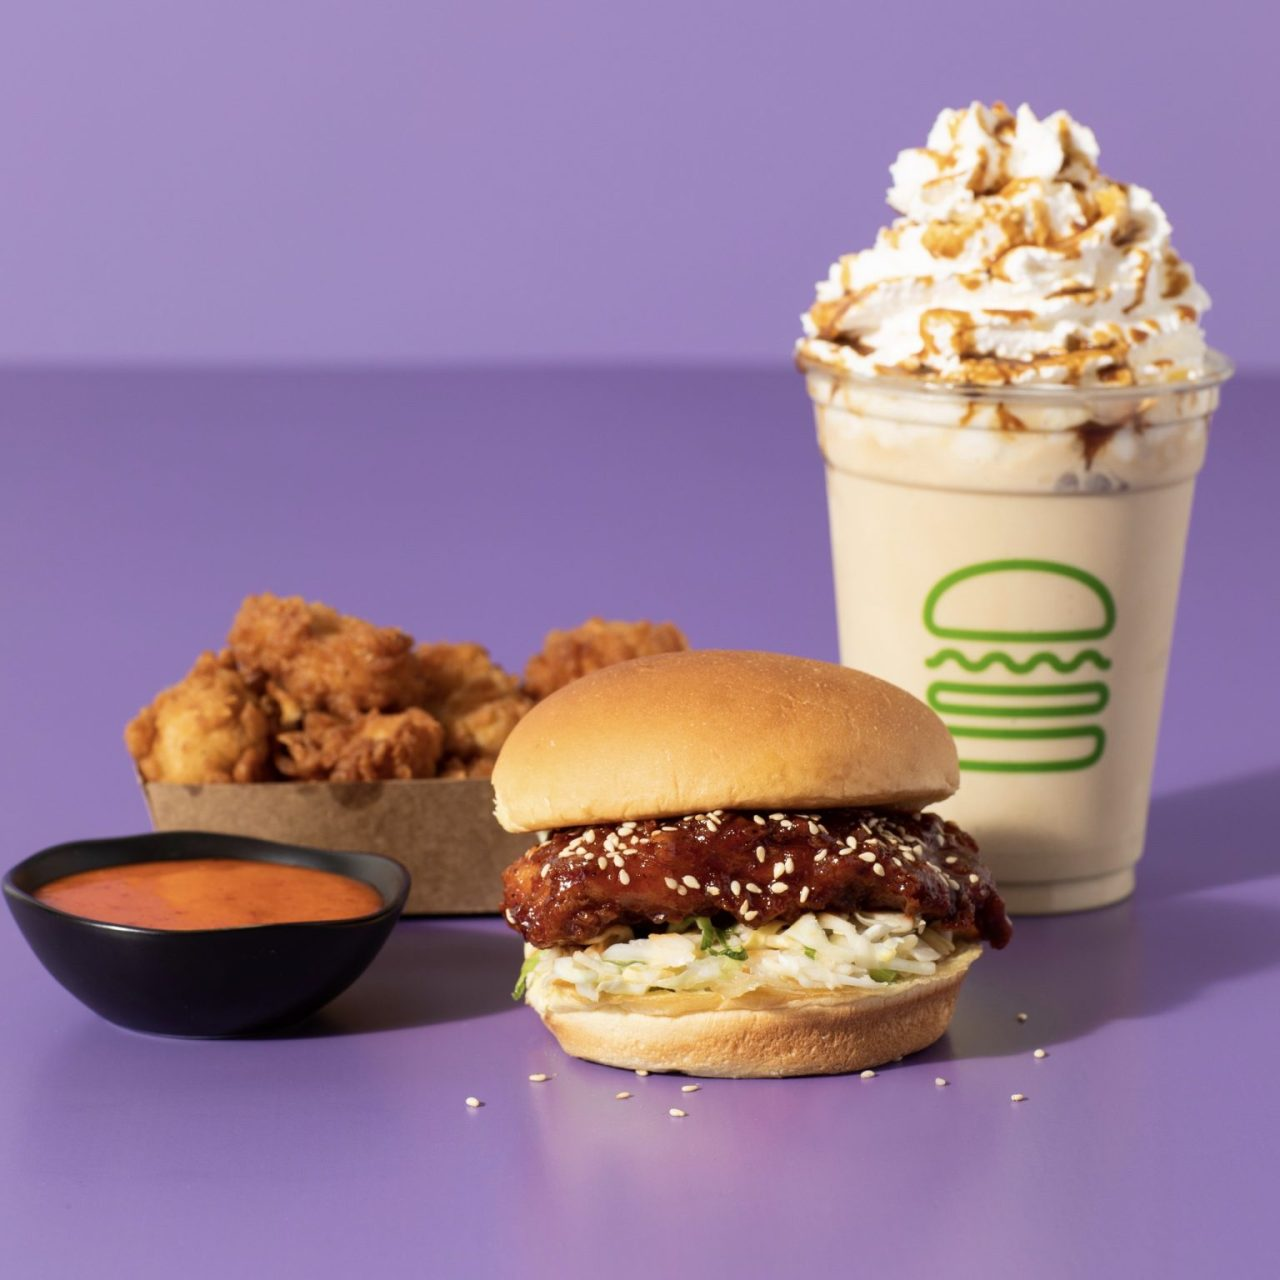 Shake Shack's Korean-style Fried Chick'n sandwich and Korean Gochujang Chick'n Bites in the US. (Shake Shack)